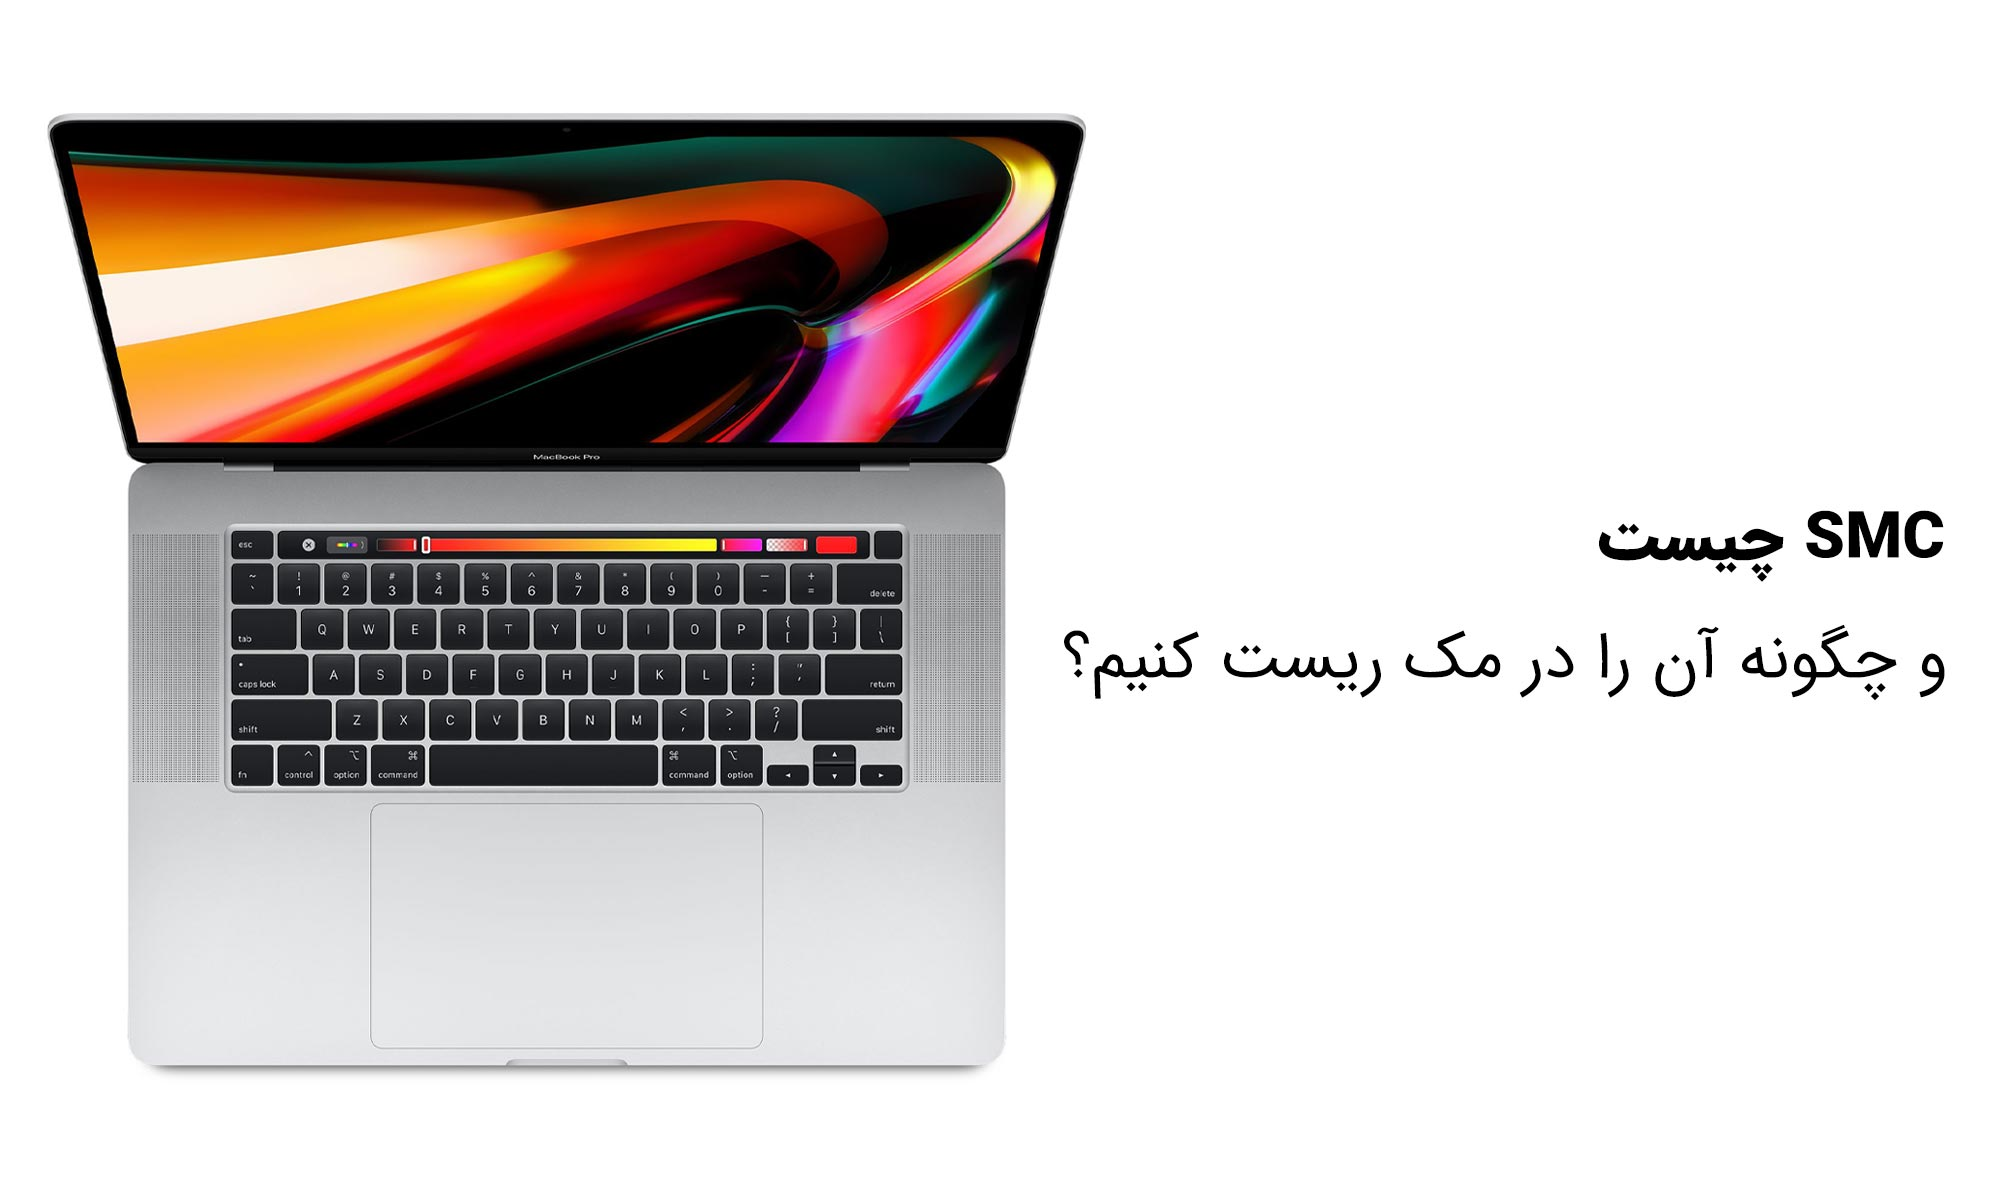 smc macbook 1